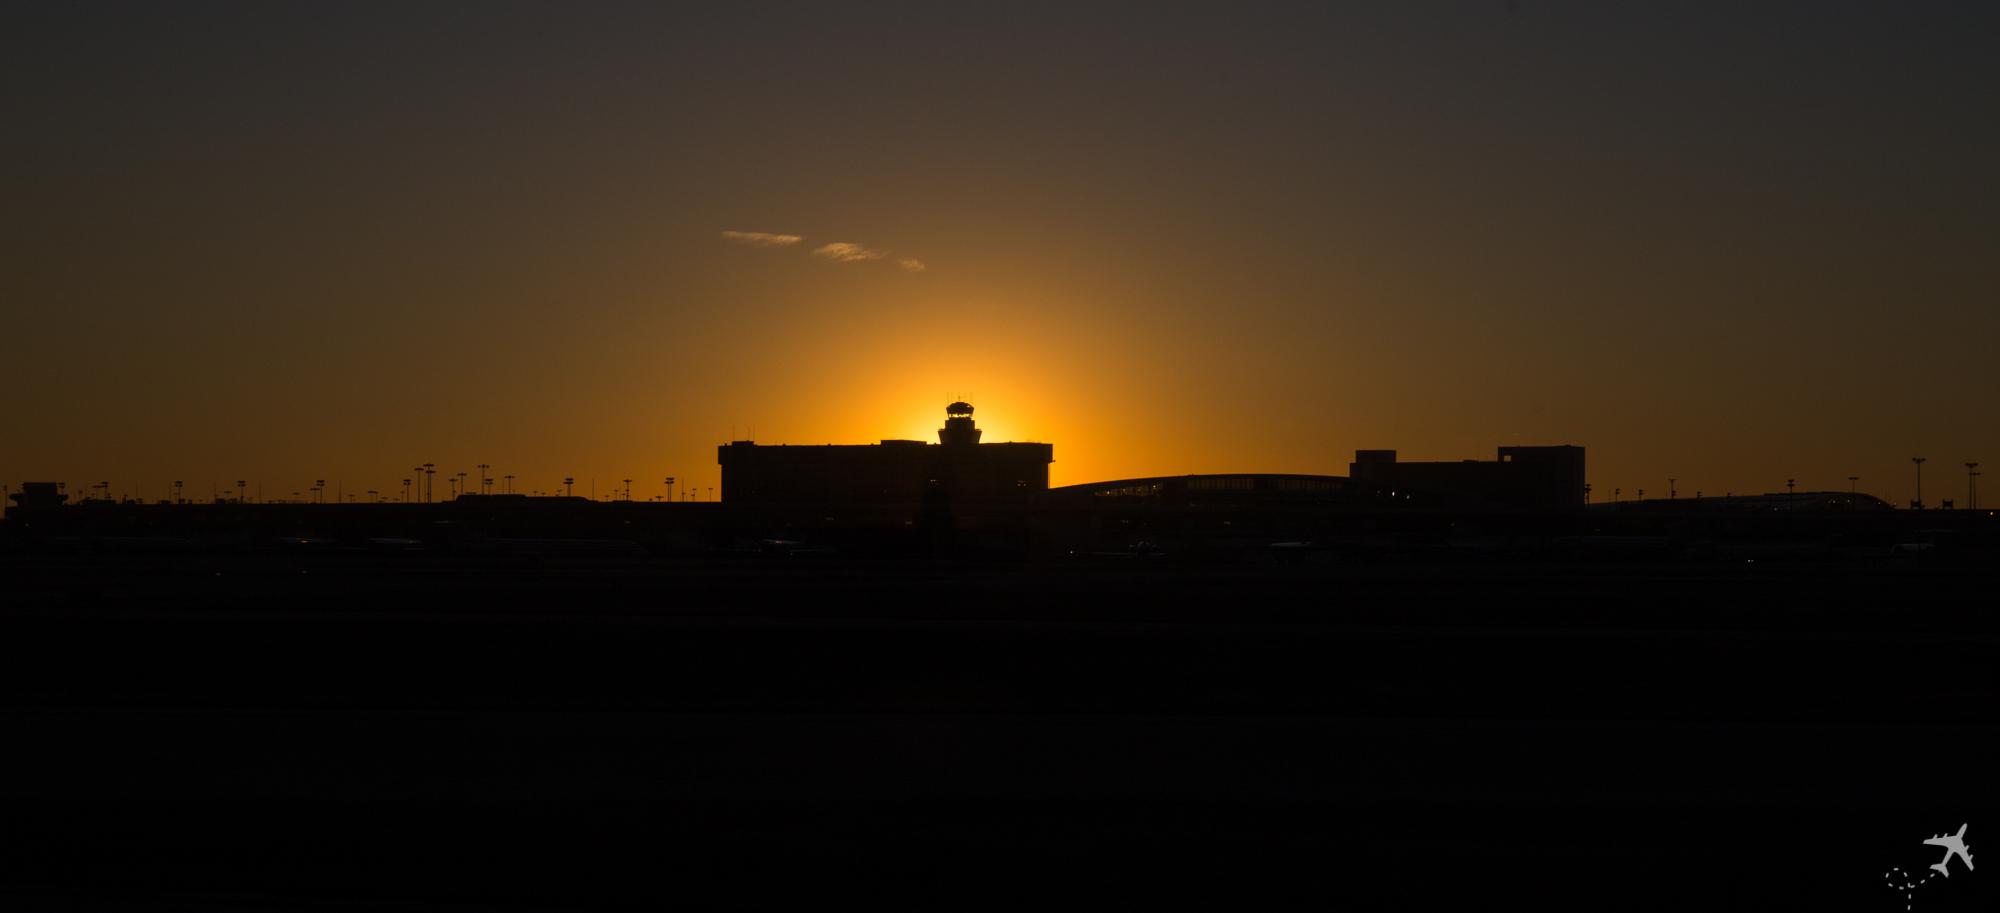 Dallas/Fort Worth International Airport [DFW]